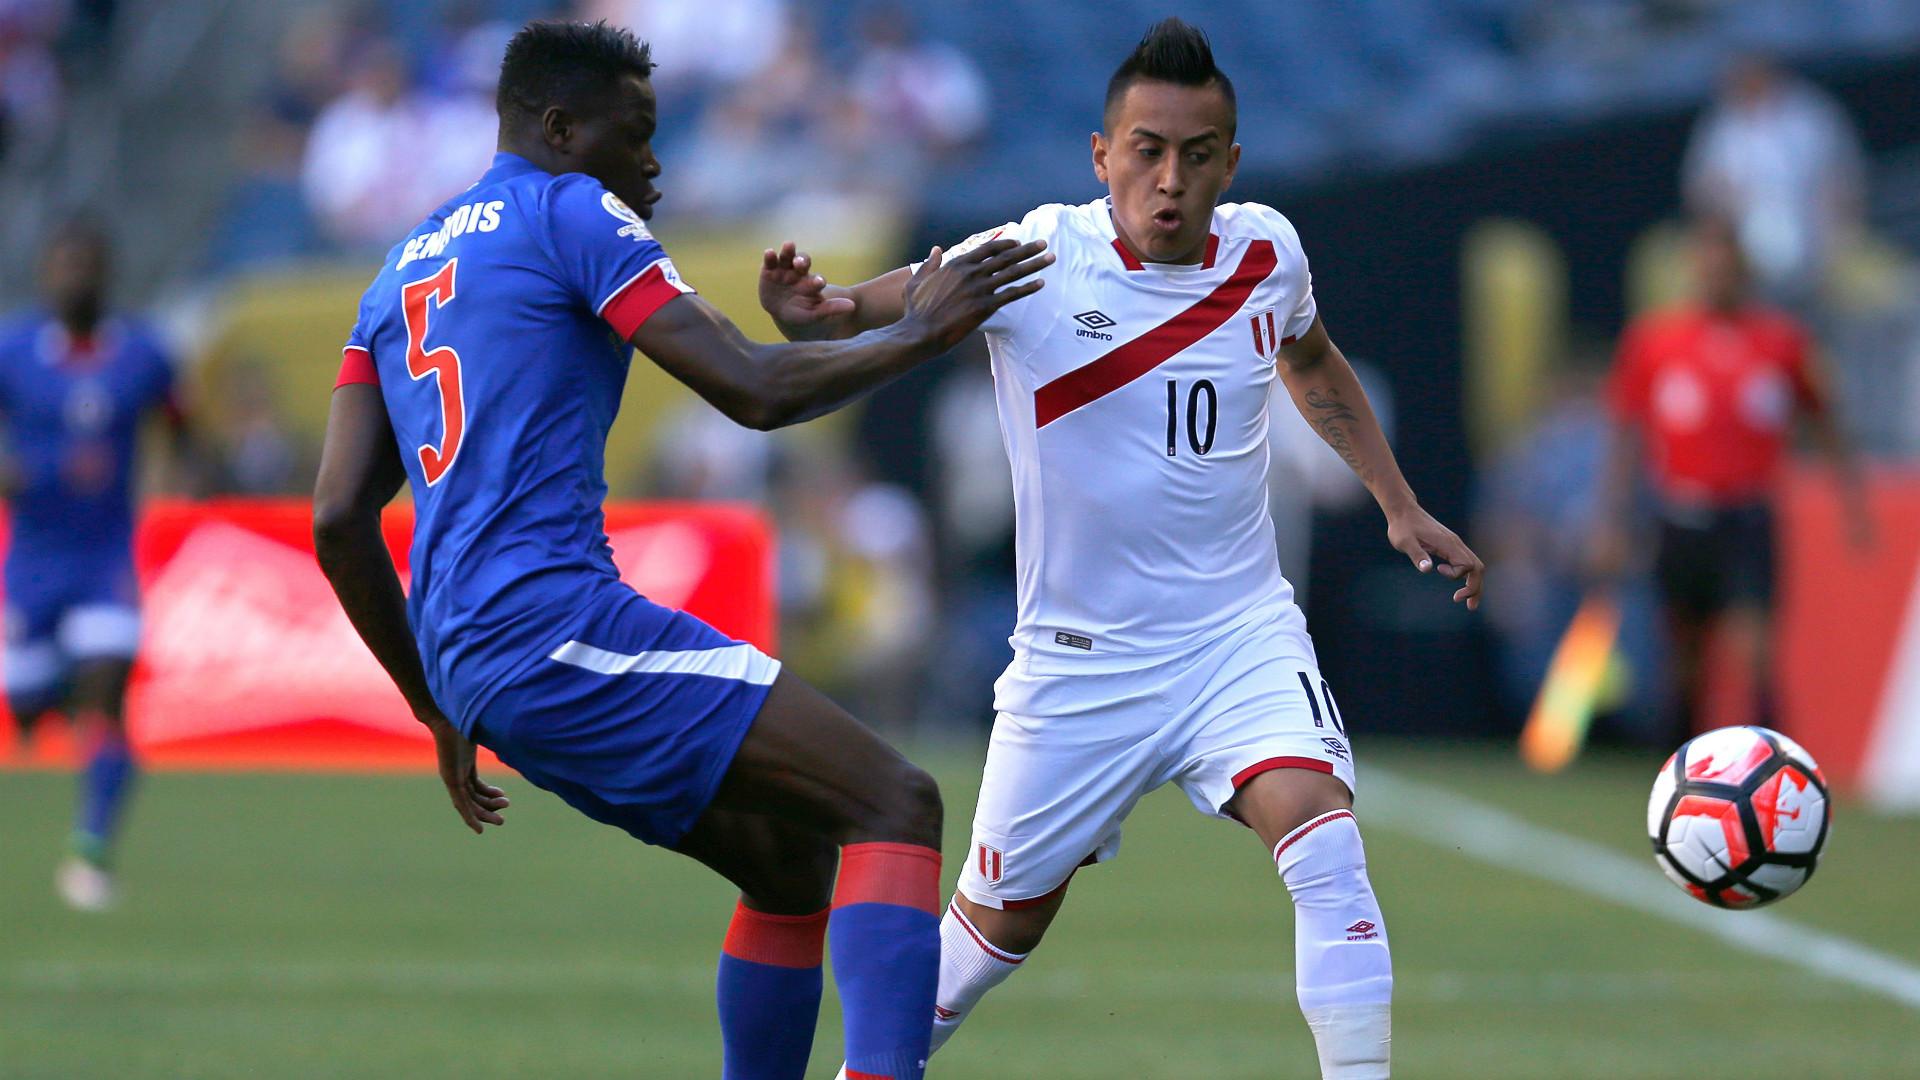 Romain Genevois Christian Cueva Haiti Peru Group B Copa America Centenario 04062016